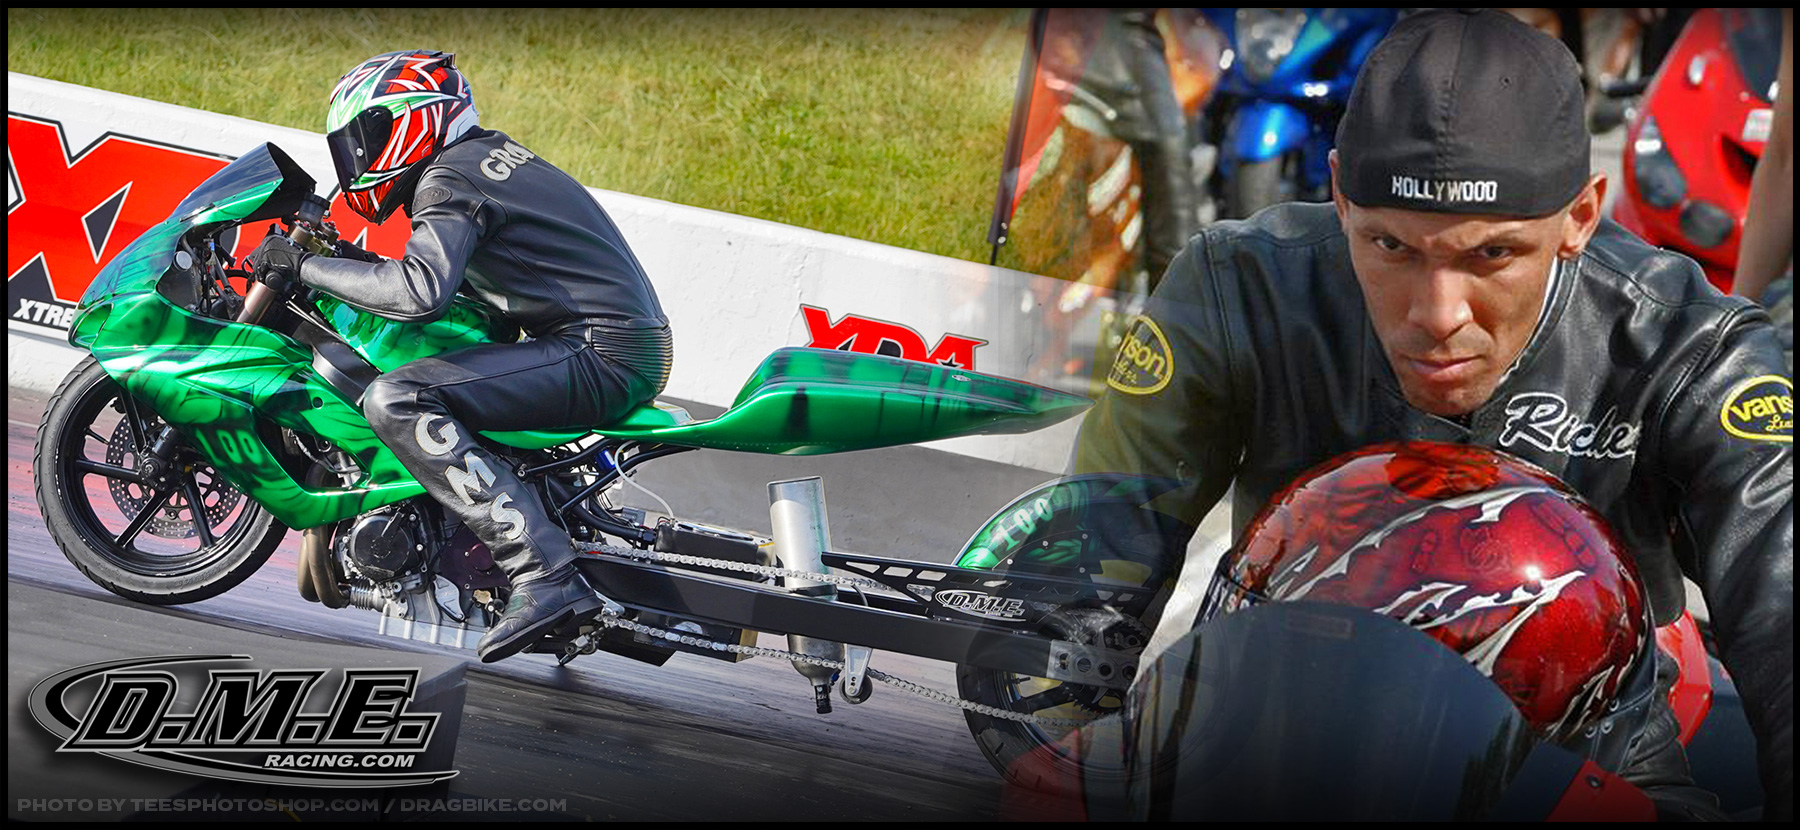 DME Racing - Rickey Grayson